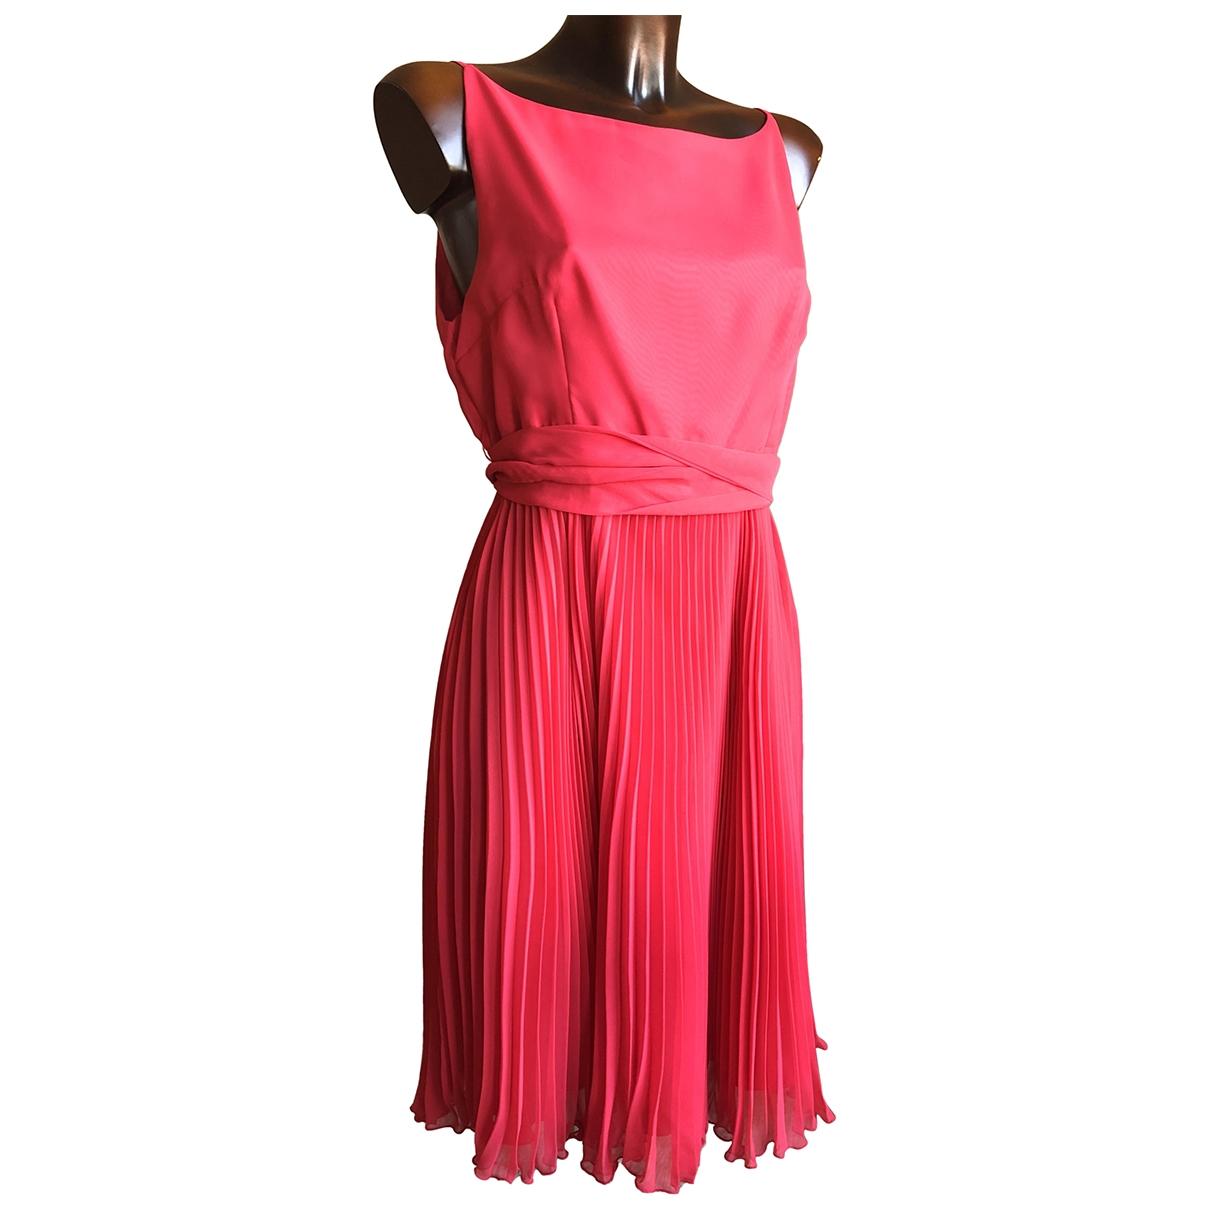 Parosh \N Red dress for Women L International